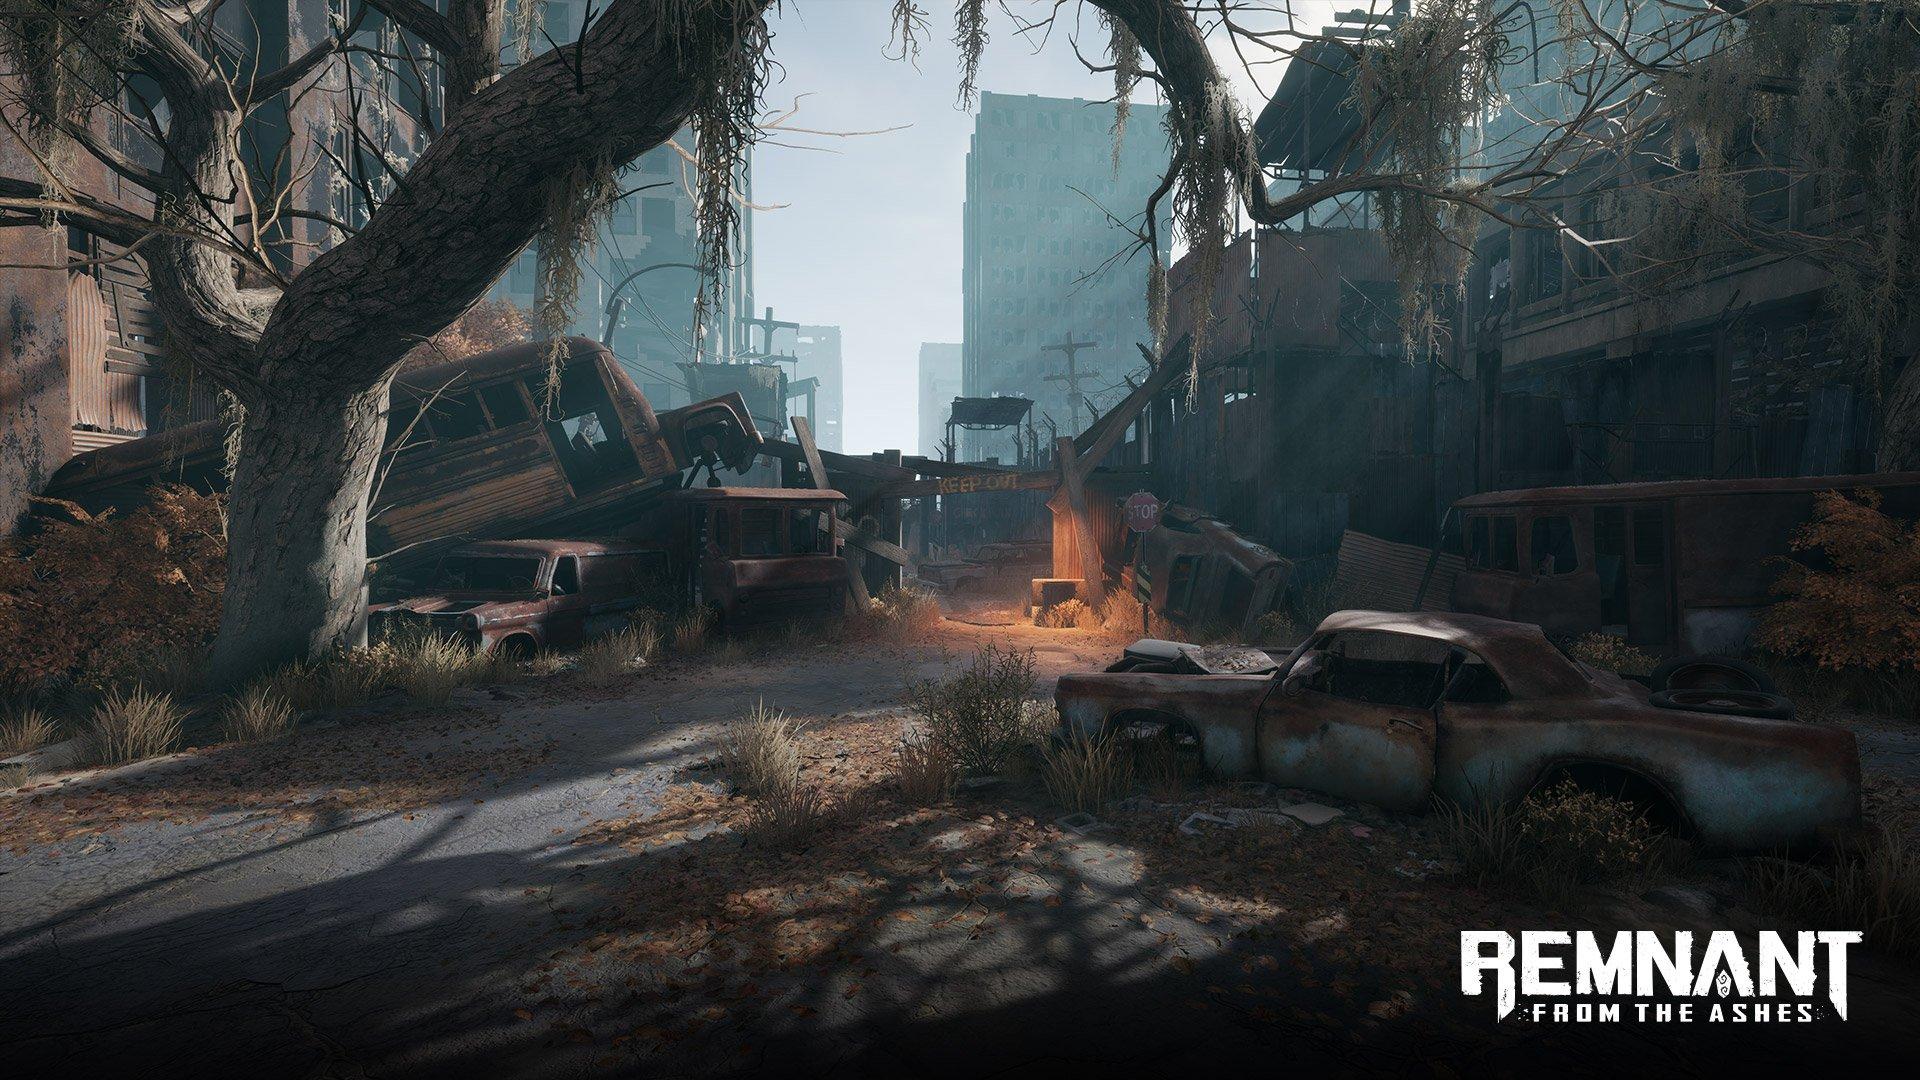 Remnant: From the Ashes é o novo game dos desenvolvedores de Darksiders 3